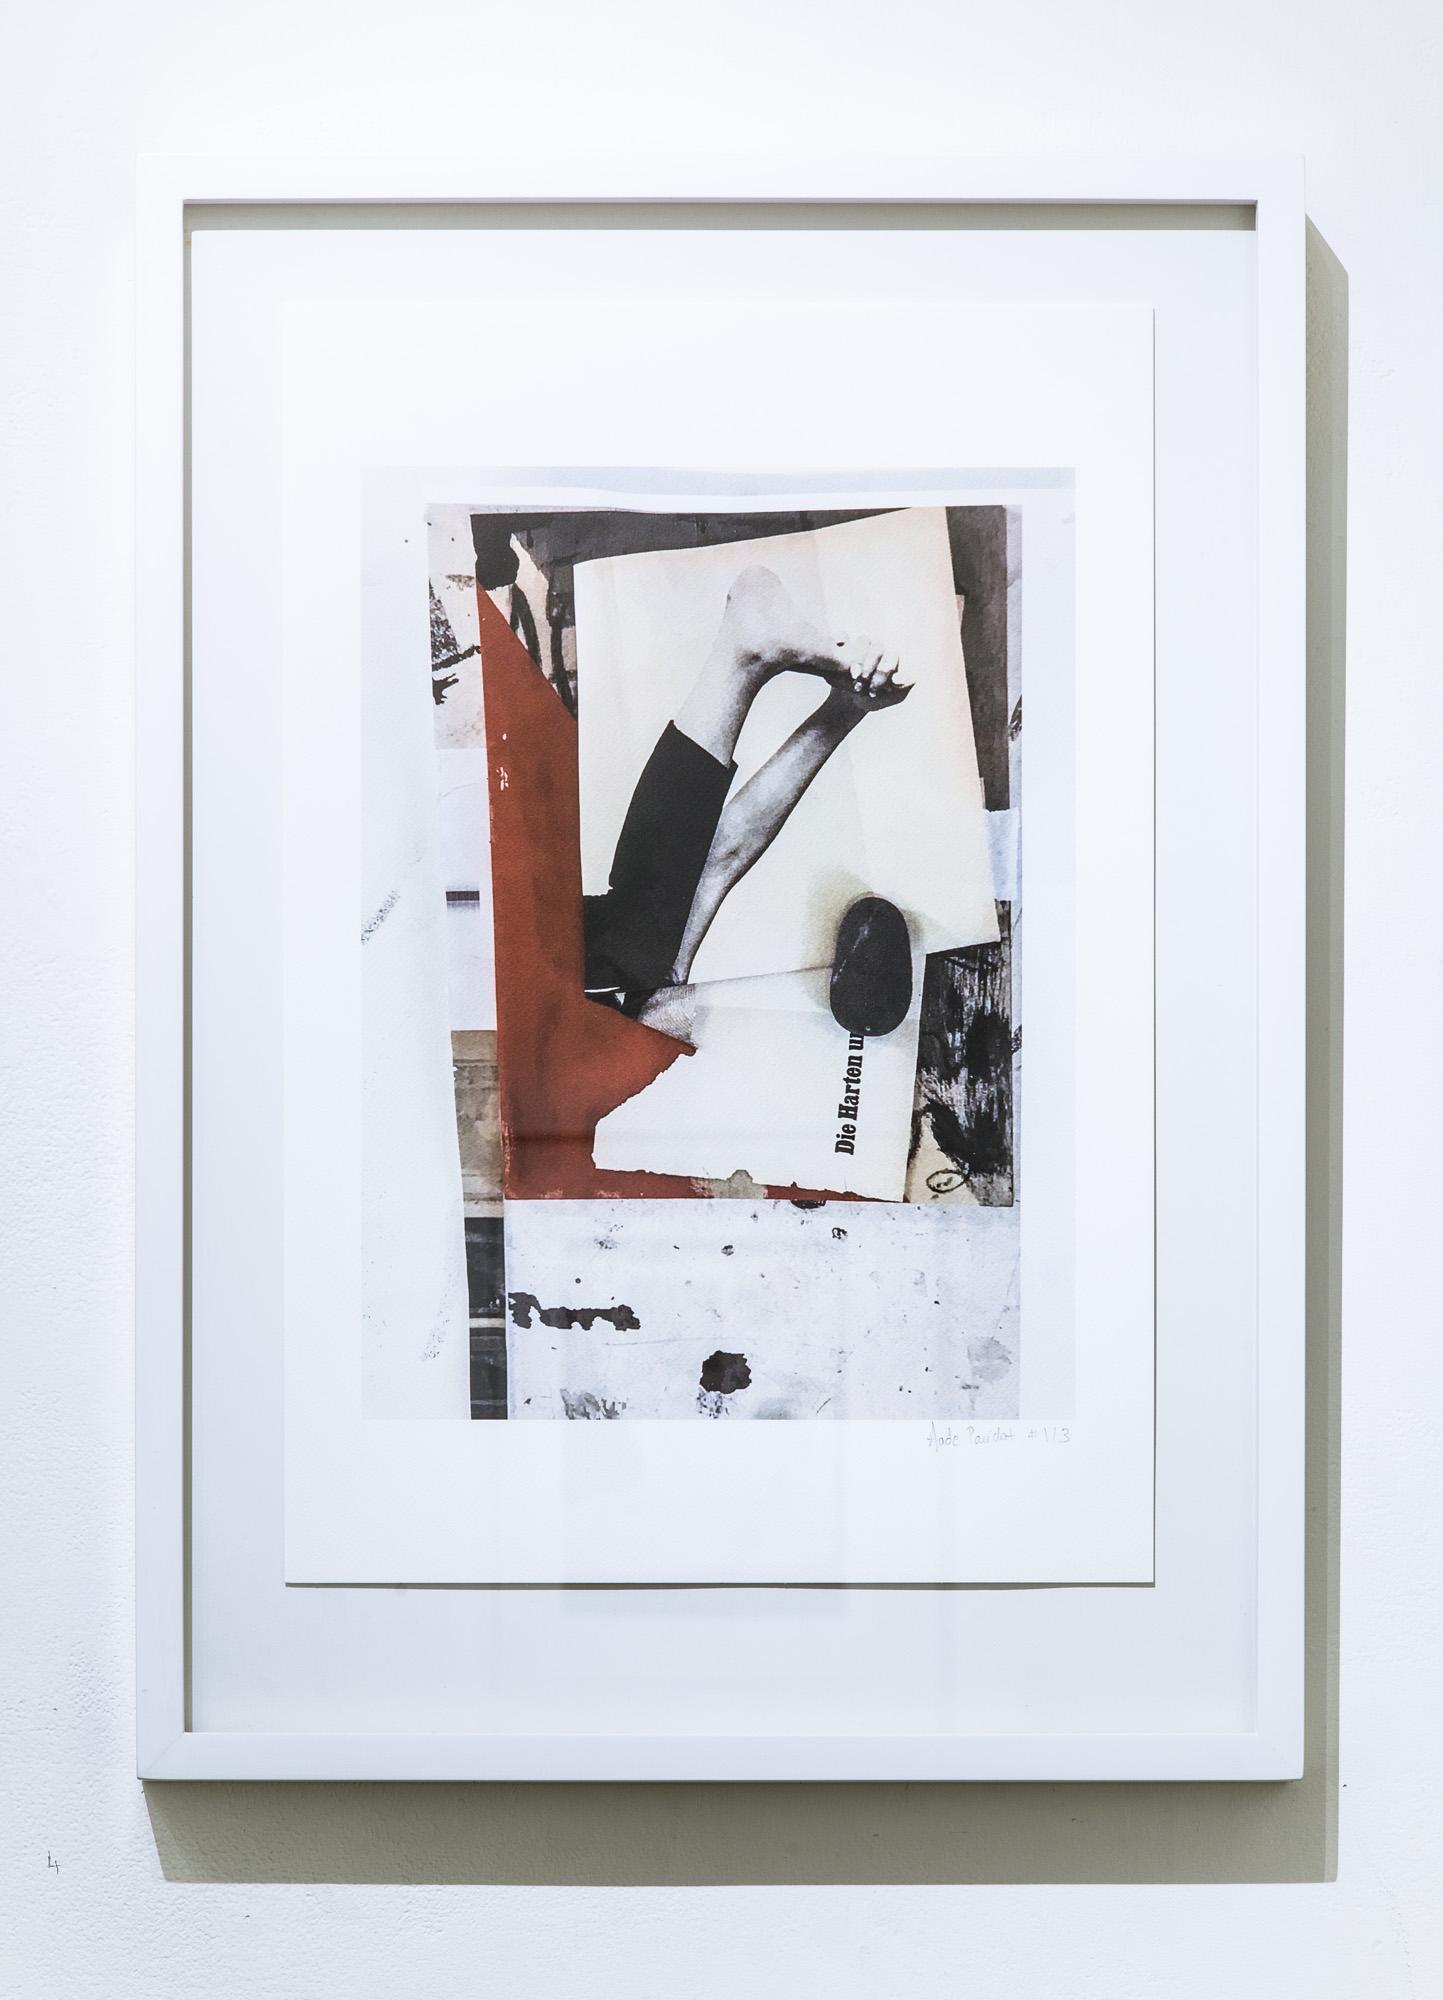 """Backbone"", Ultra-chrome archival pigments print on aquarelle paper 44cm x 61cm, 2017, Edition of 3 +1AP"